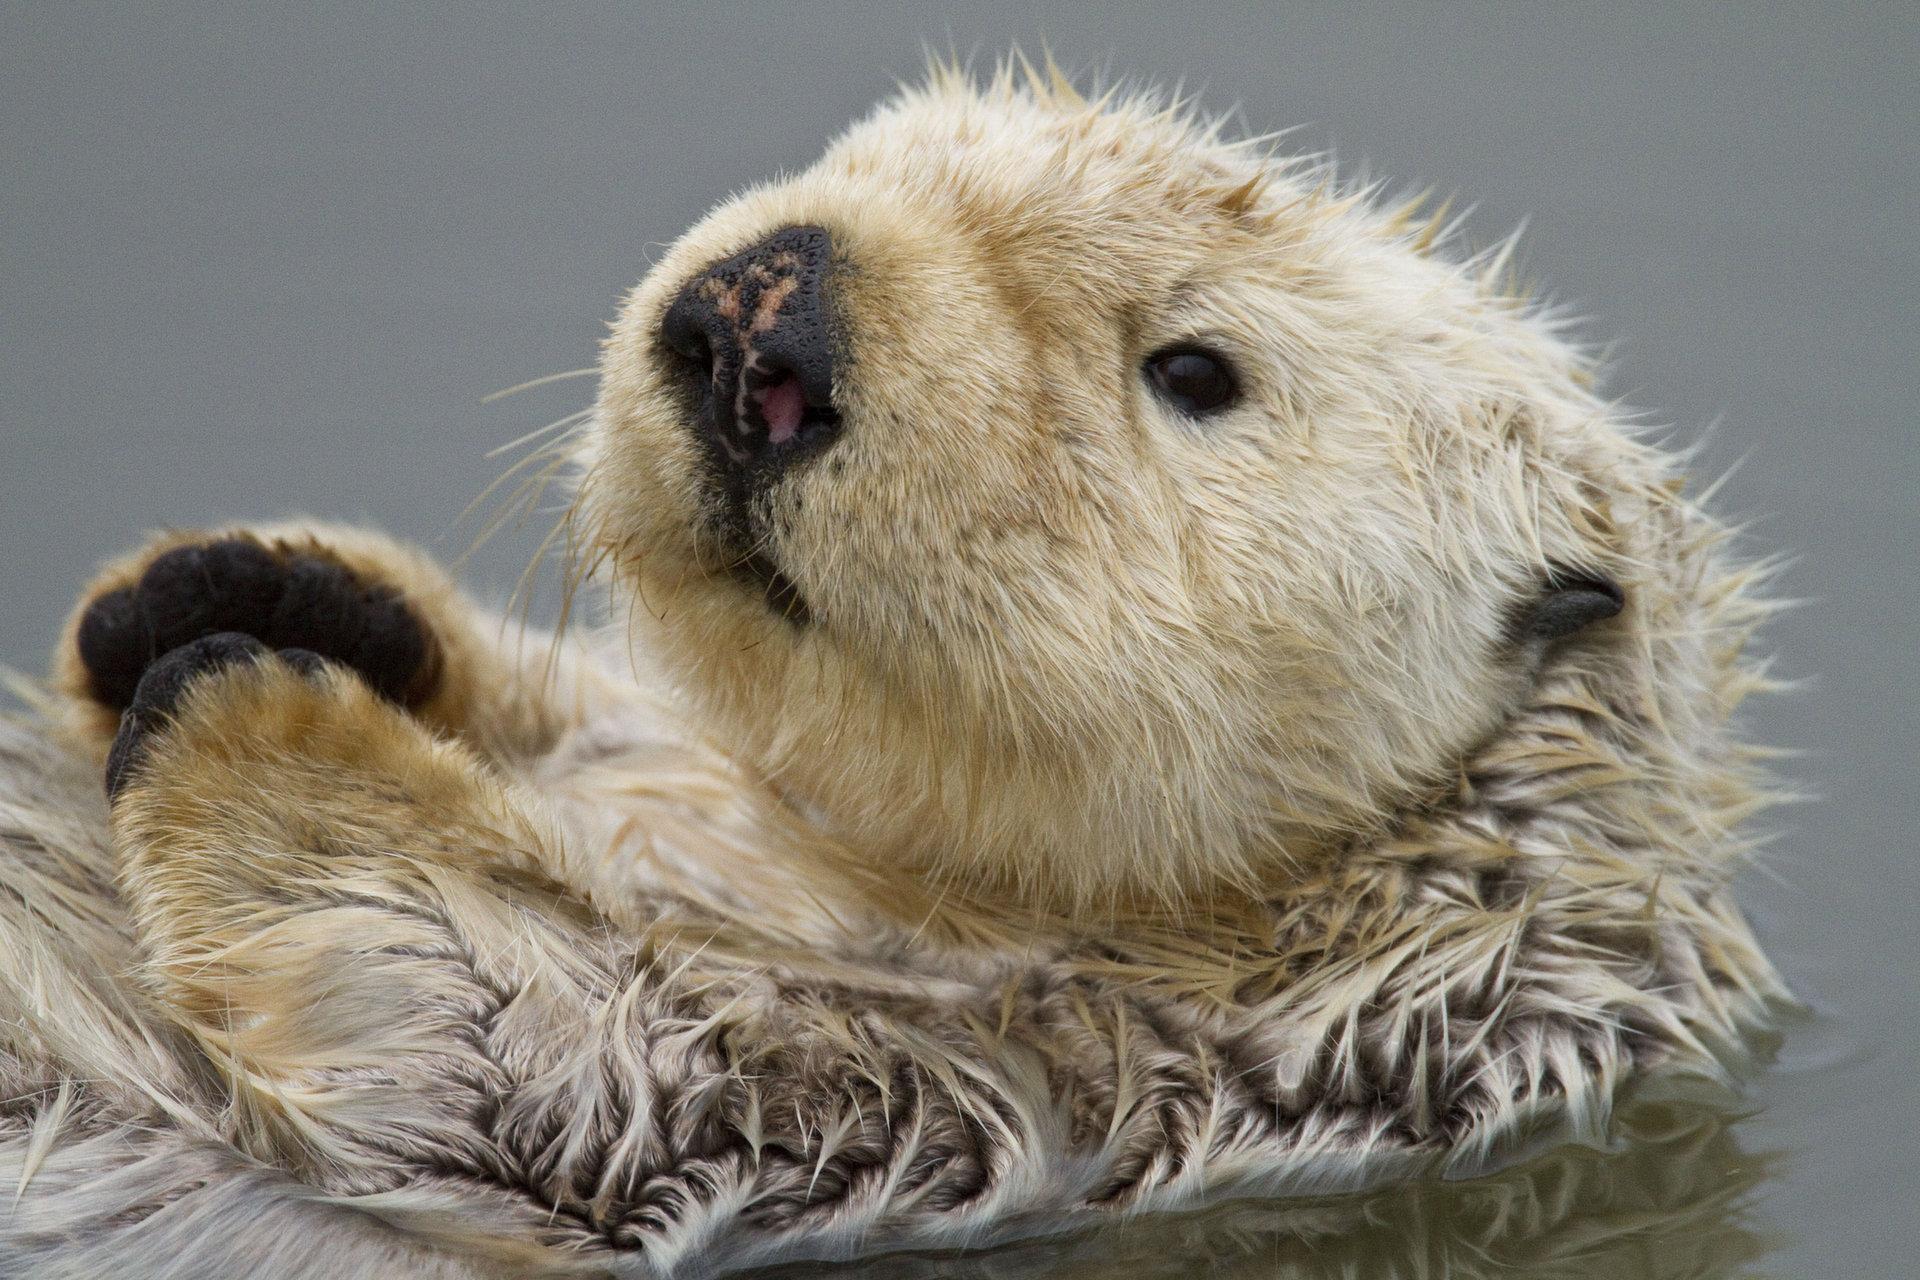 Sea Otter 952524 Sea Otter 952513 Sea Otter 952531 Sea Otter 1920x1280